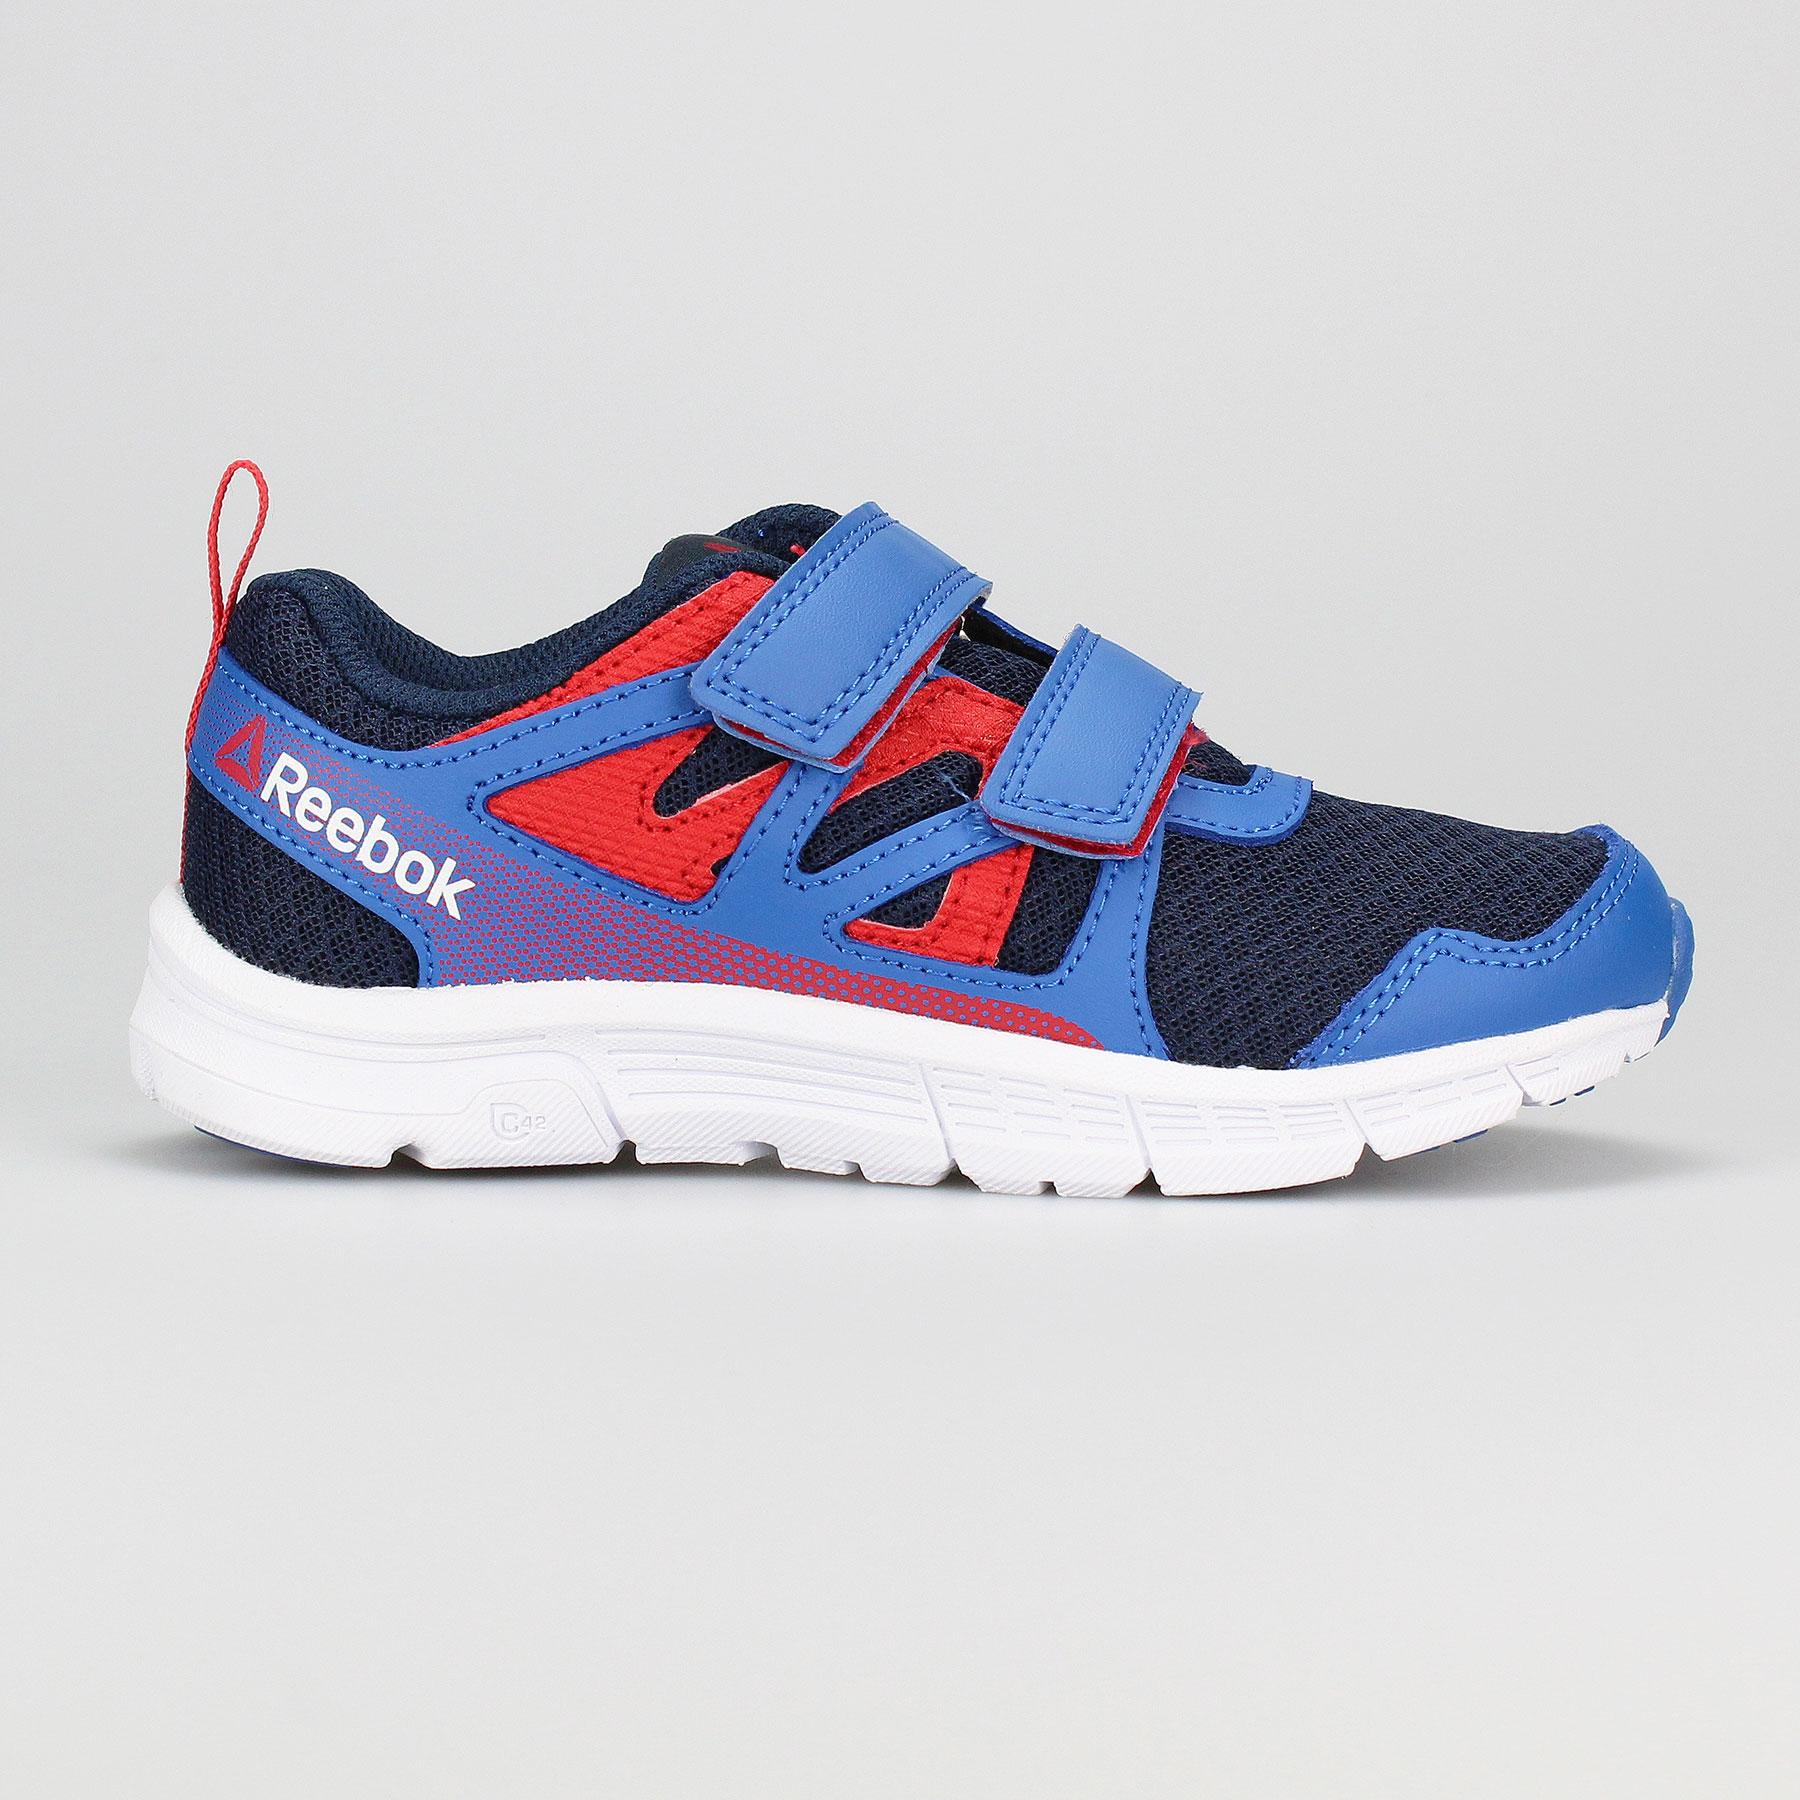 7d86cf5c5b9 Reebok Run Supreme 2.0 2V BS8455   Αθλητικά Παιδικά Παπούτσια ...